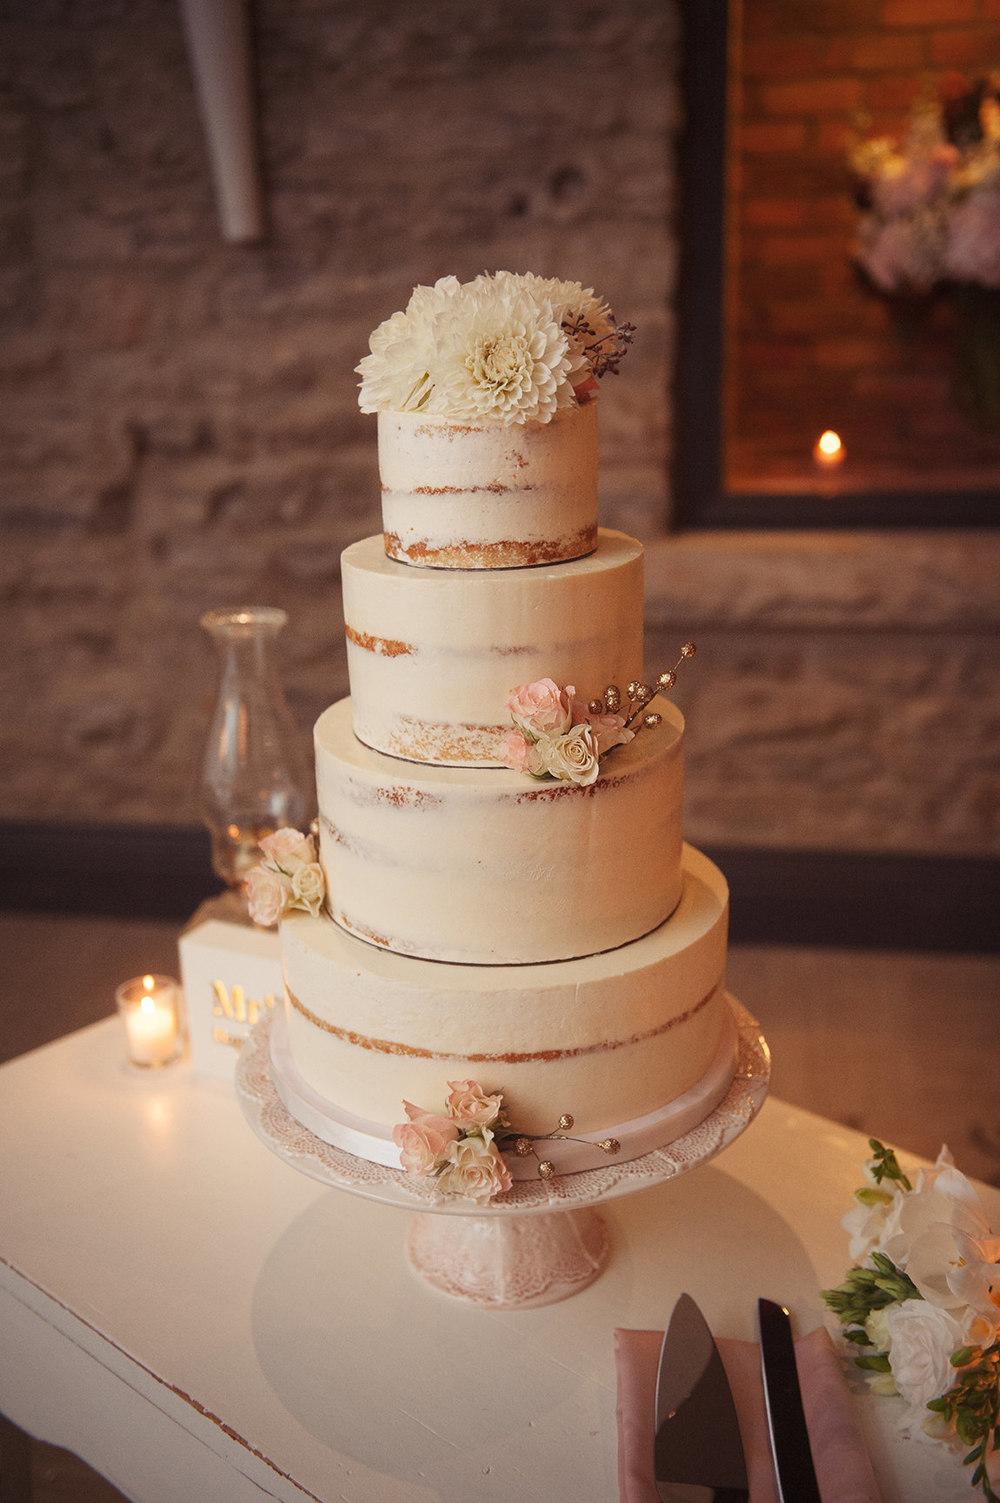 St-Catharines-Wedding-Stone-Mill-Inn-Amy-Darryl-photography-by-Morgan-Falk-076.JPG